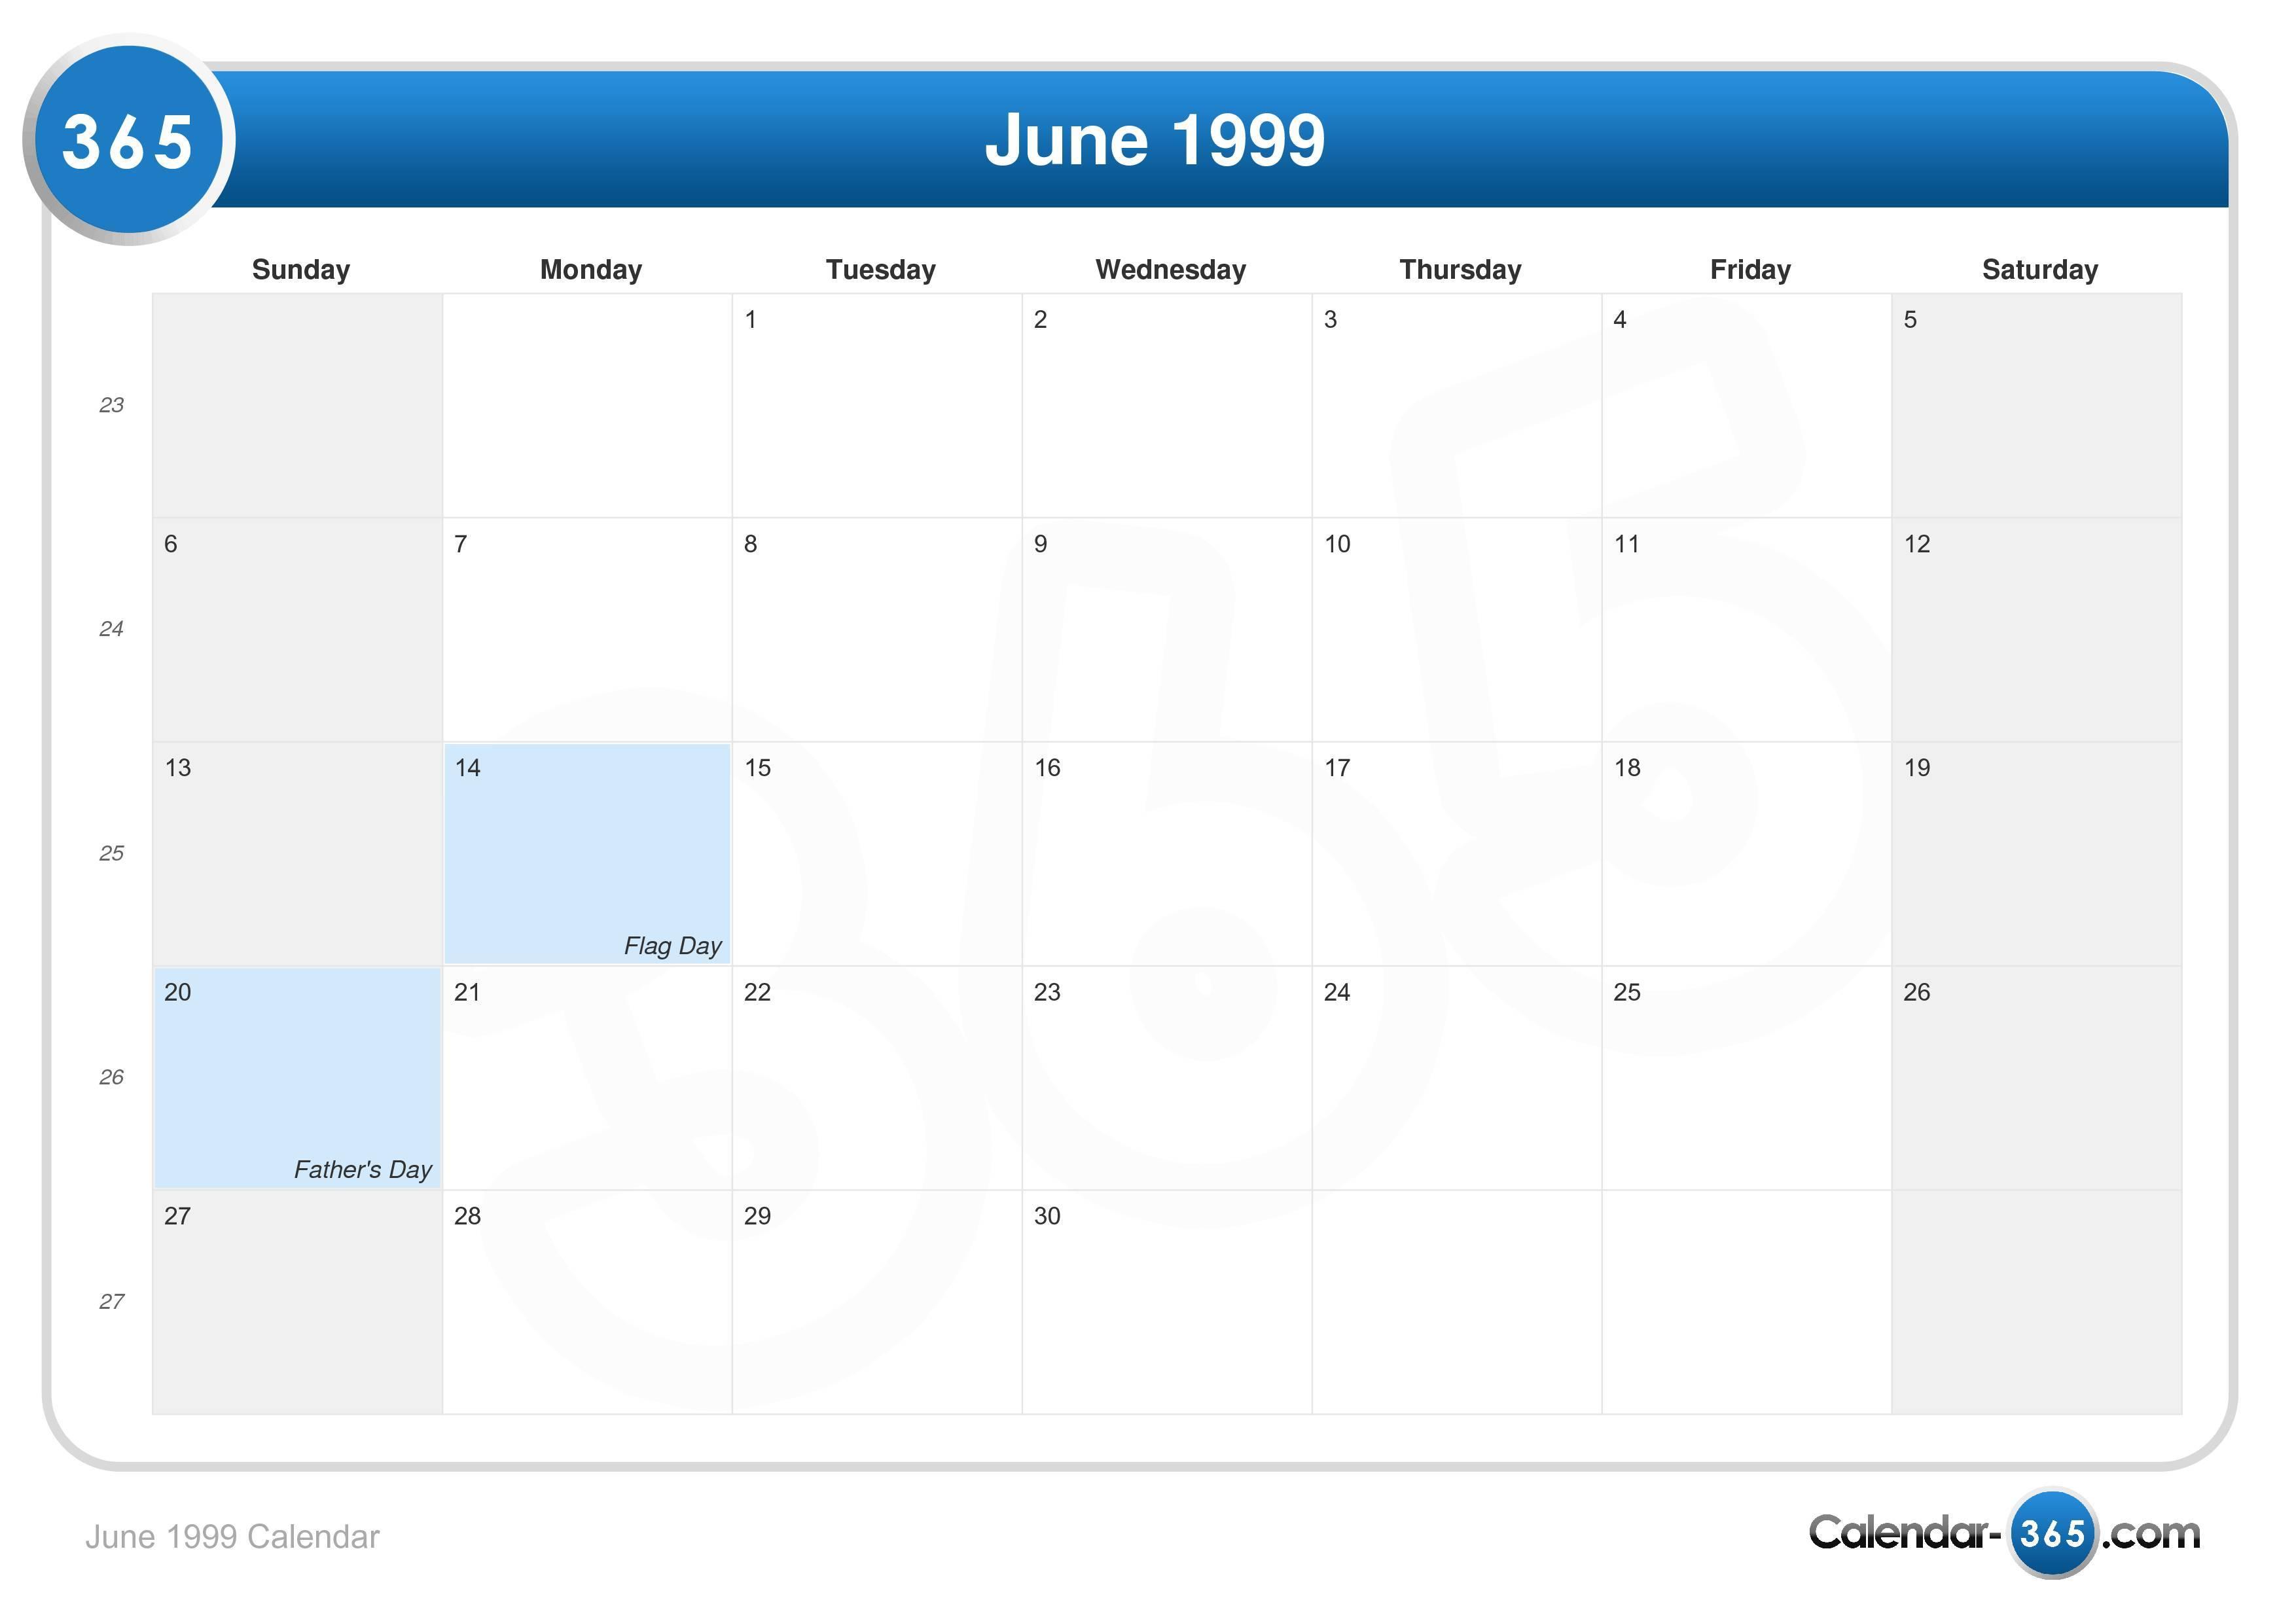 June 1999 Calendar